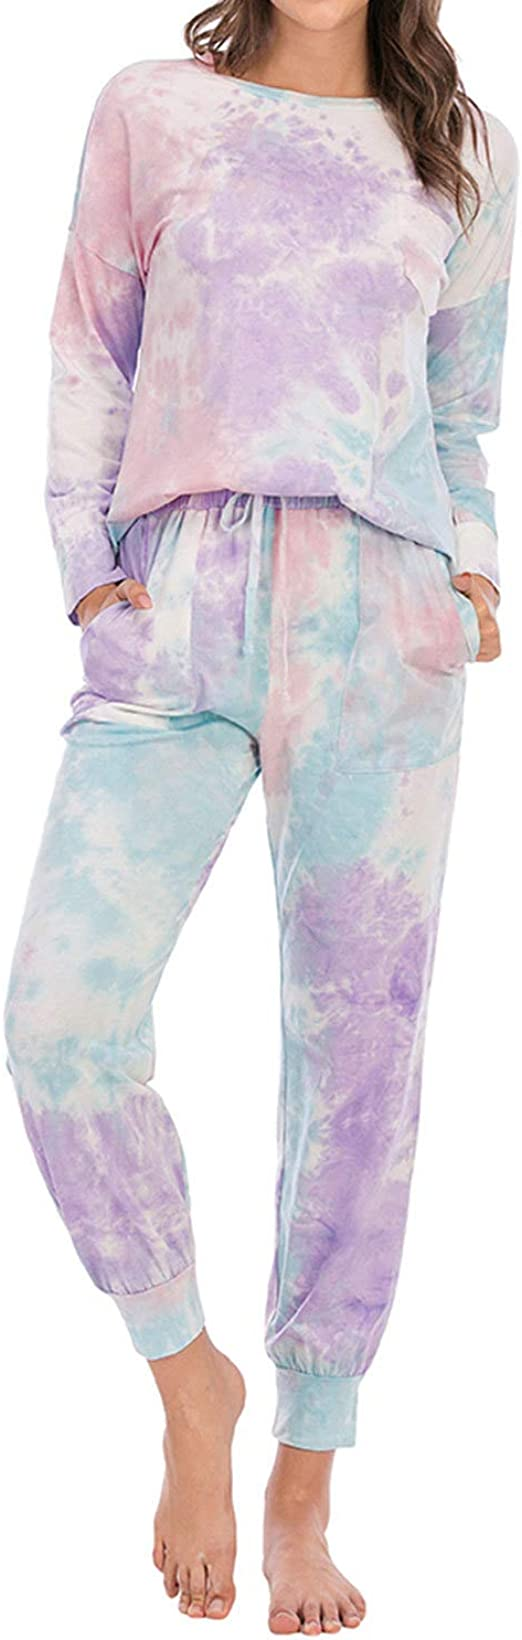 Lu's Chic Women's Lounge Sets 2 Piece Pajama Long Sleeve Soft Loungewear with Pockets